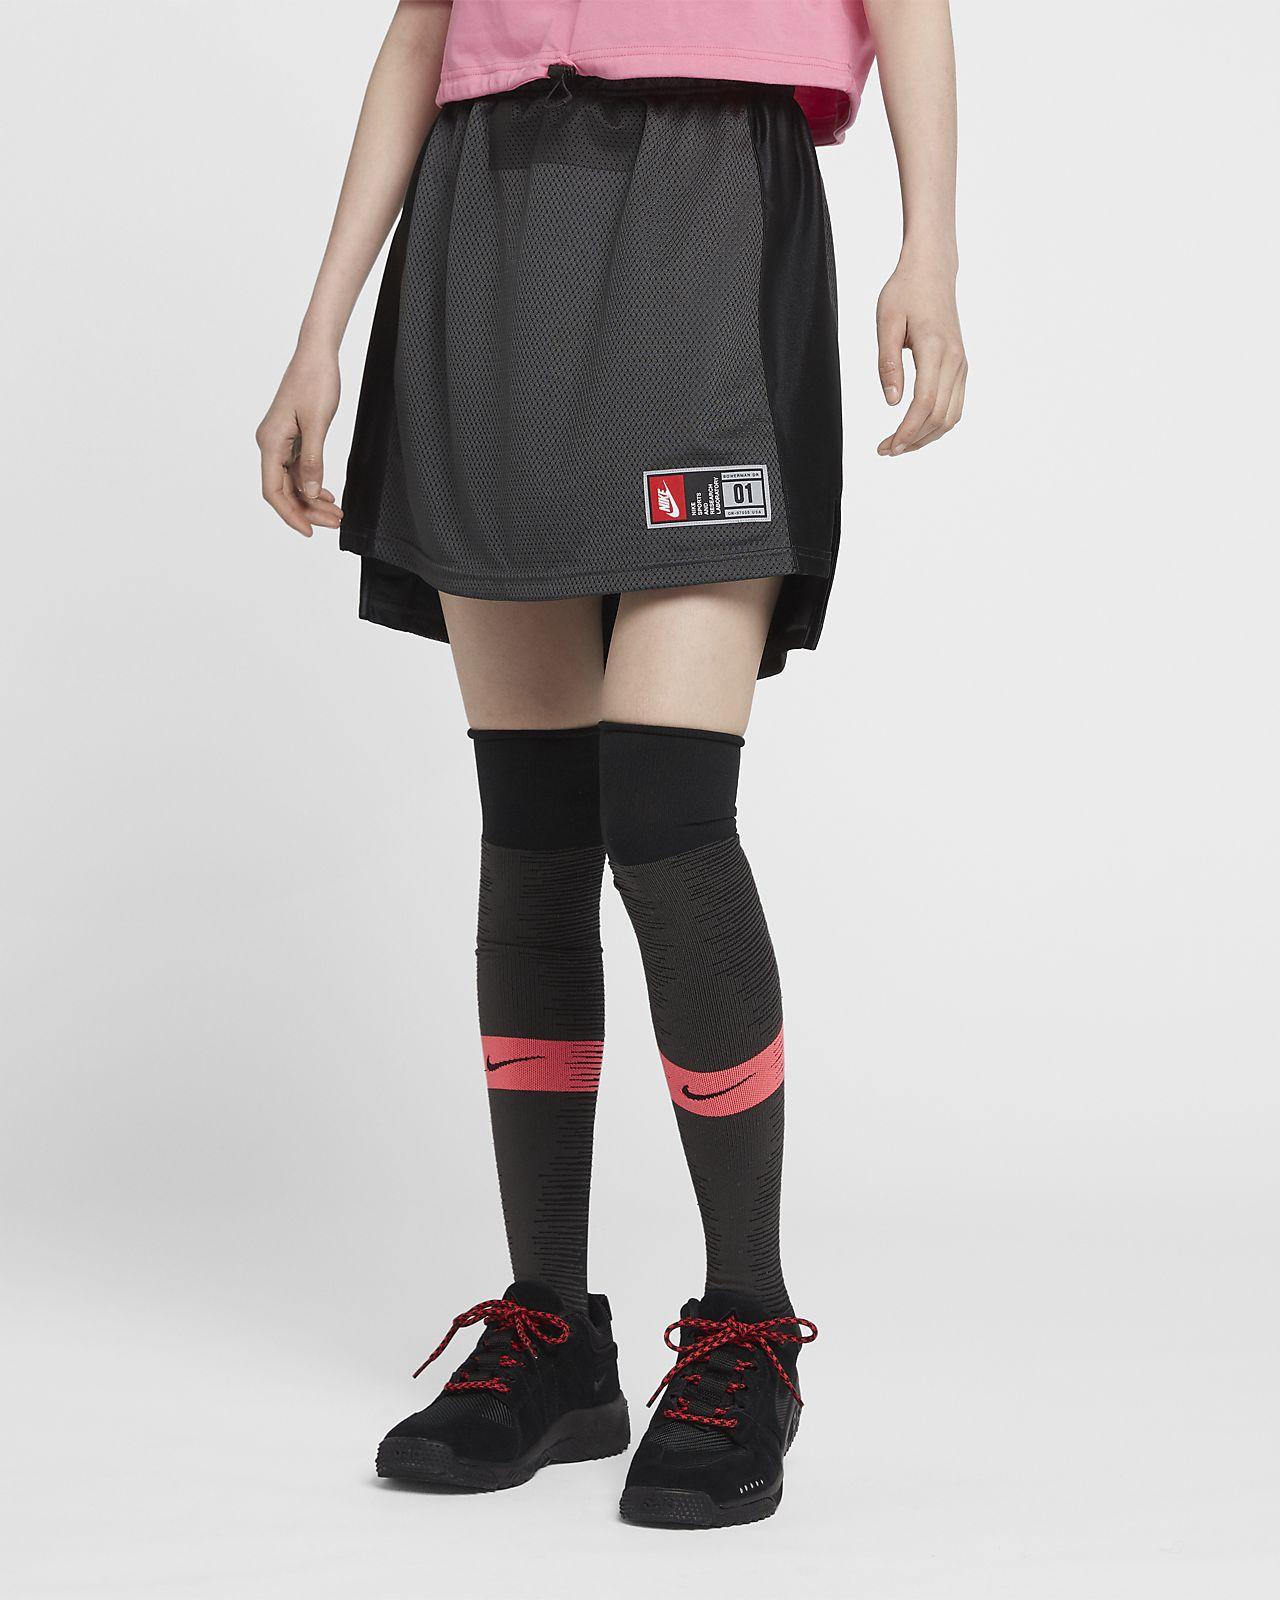 Nikelab FemmeFr Jupe Collection Pour Américain Football De htsdrQ